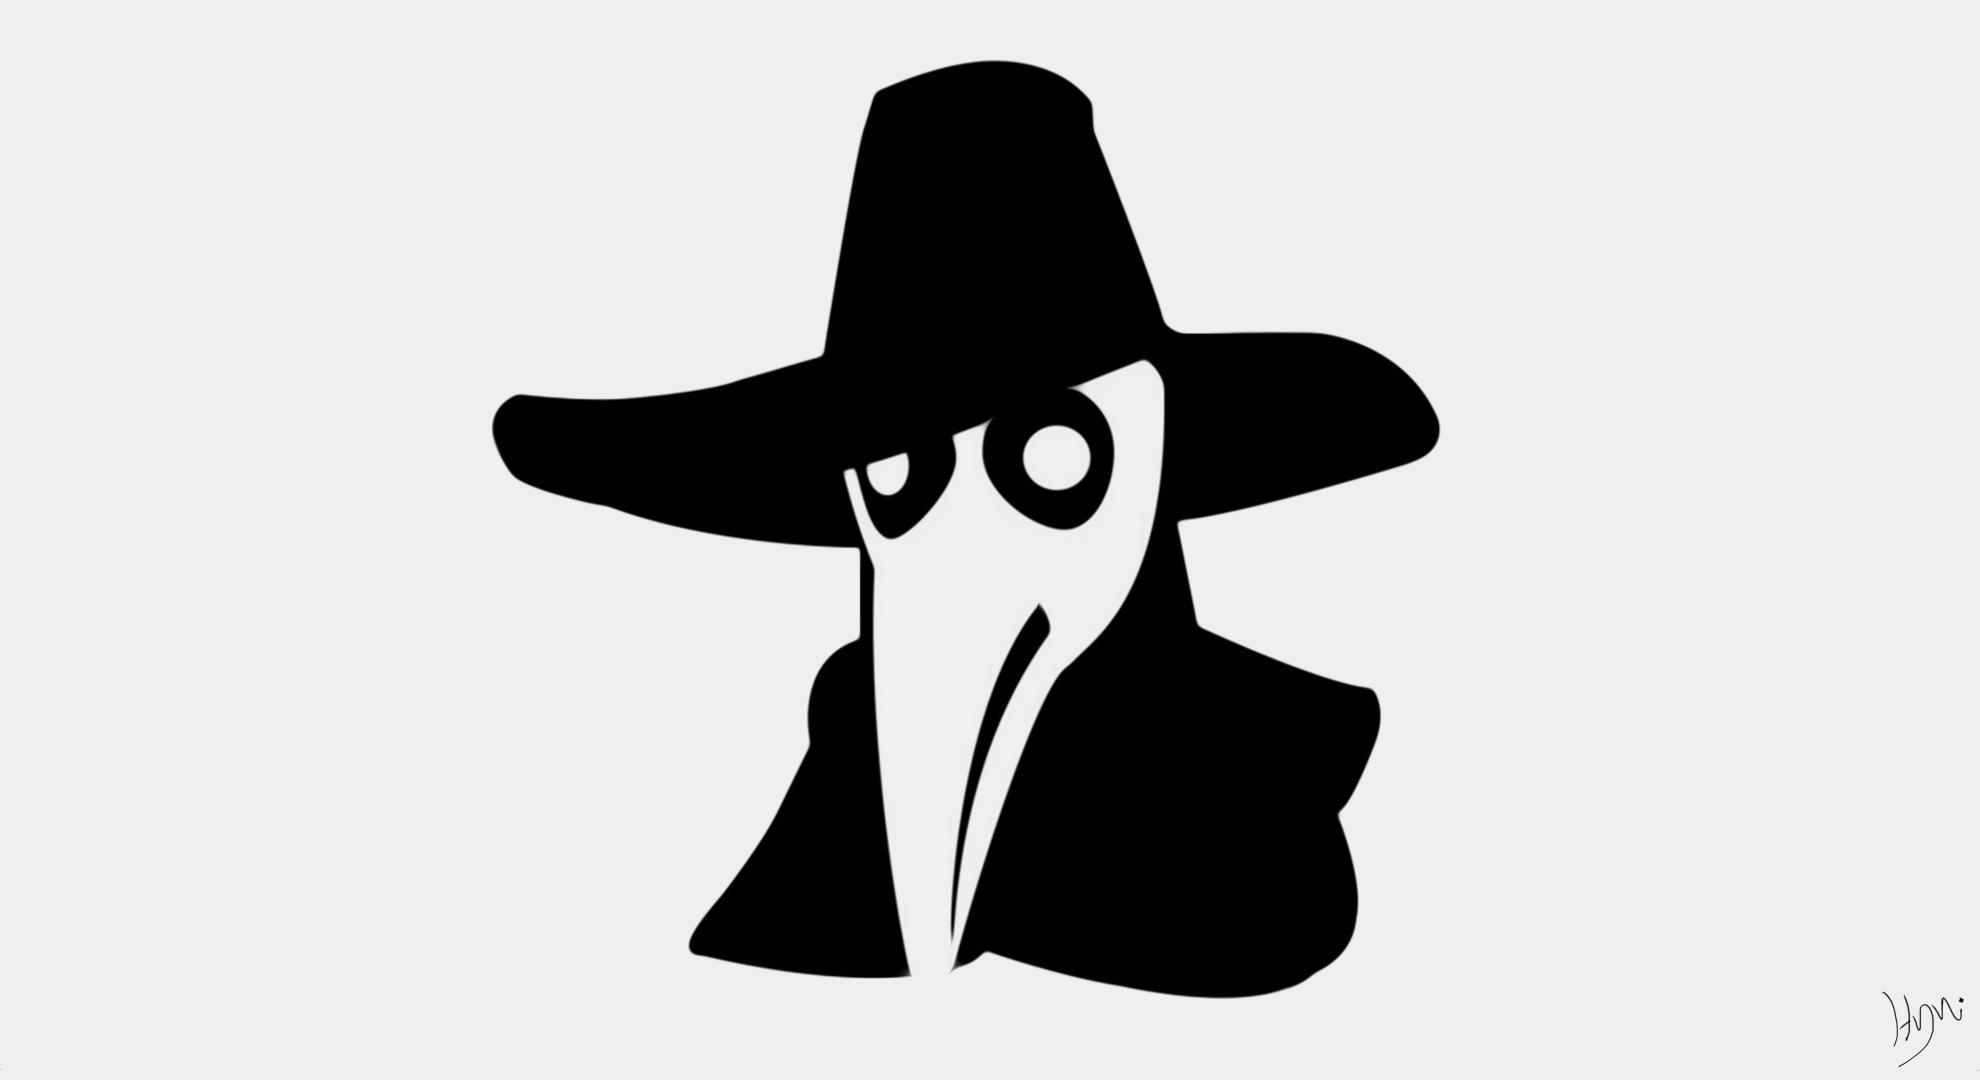 Moustache Wallpaper Hd Wallpaper Black Illustration Dark Silhouette Logo